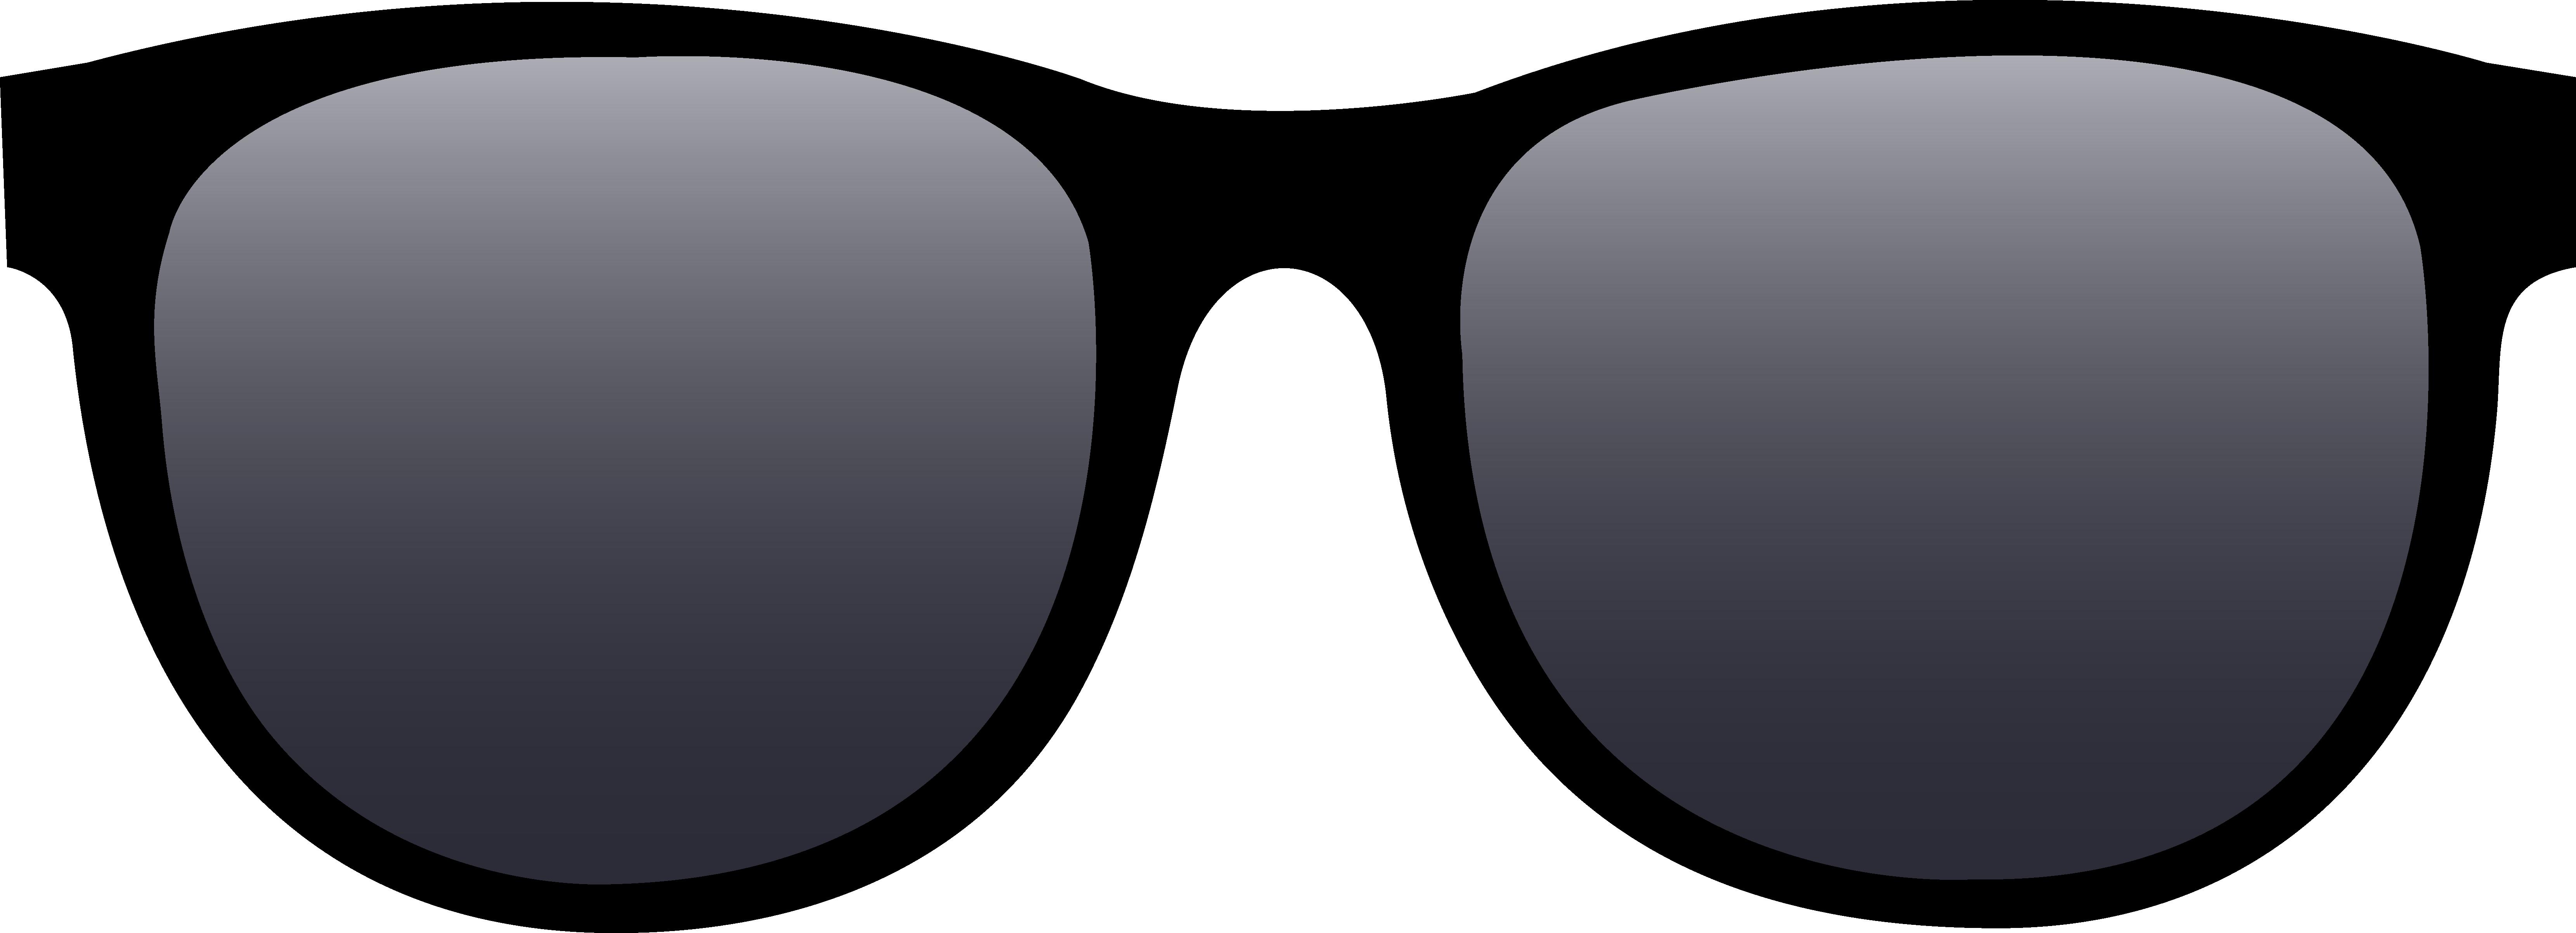 Sunglasses Vector Free-Sunglasses Vector Free-15